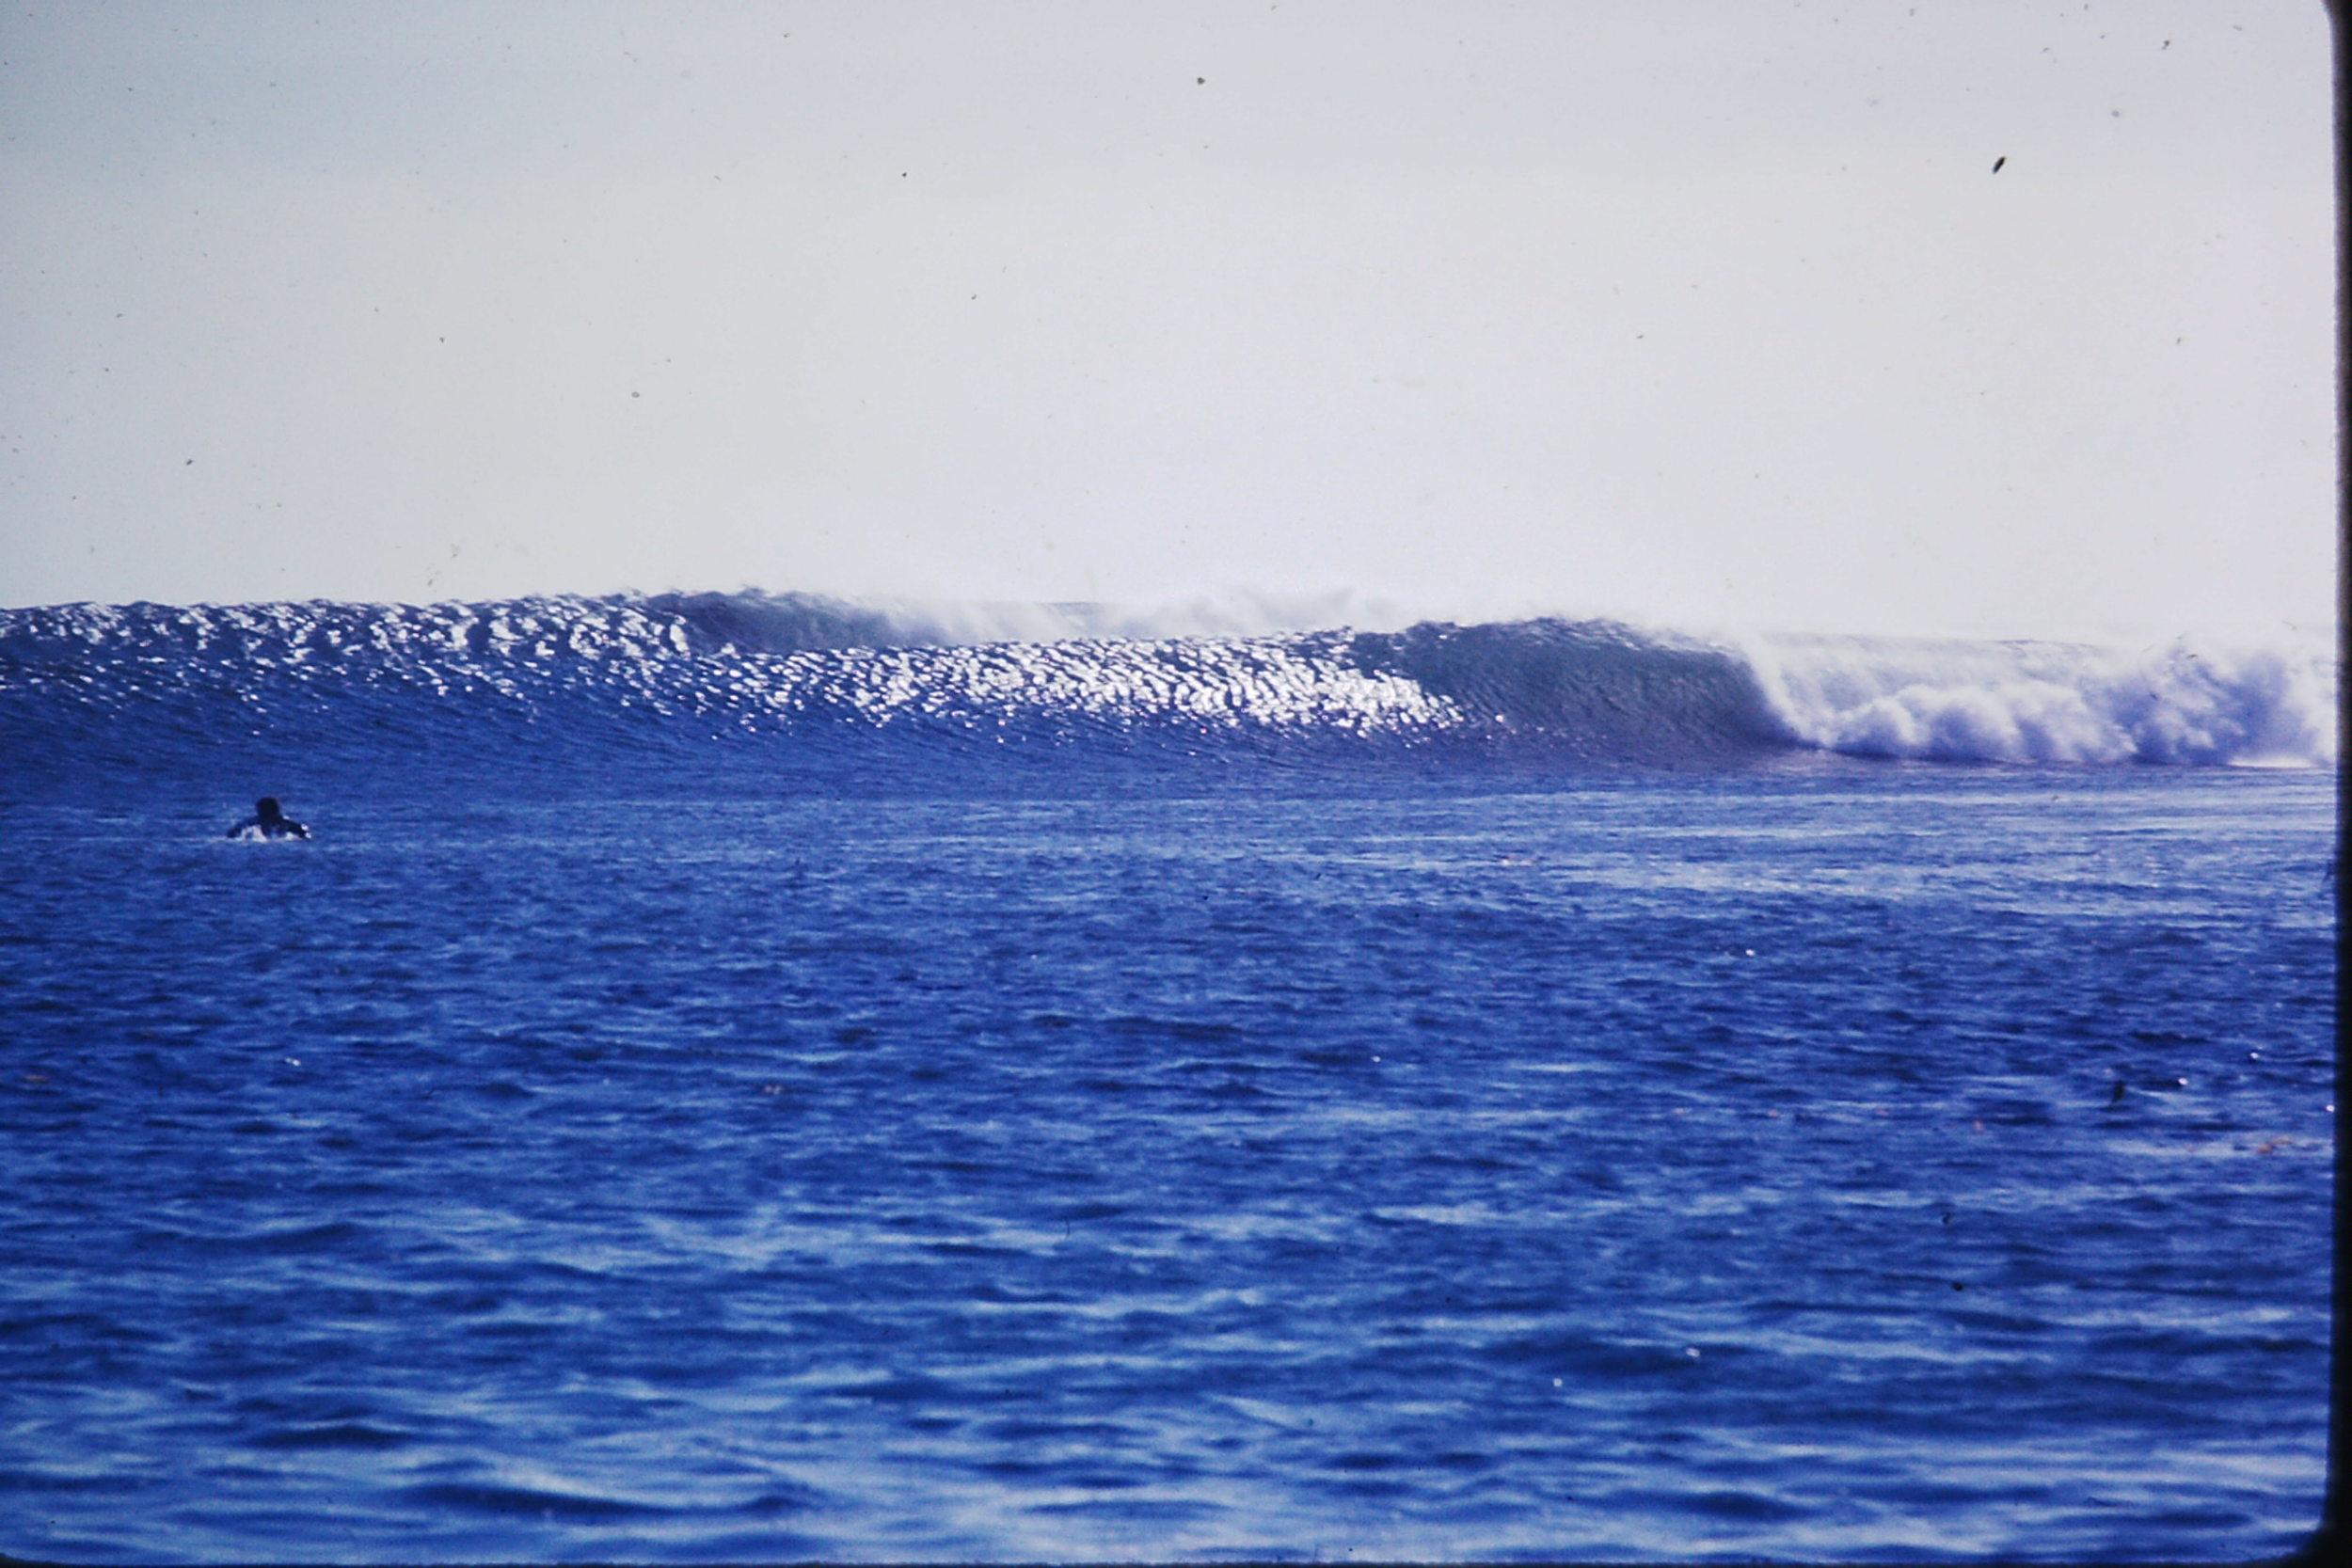 bruce_jones_surfboards_3.JPG